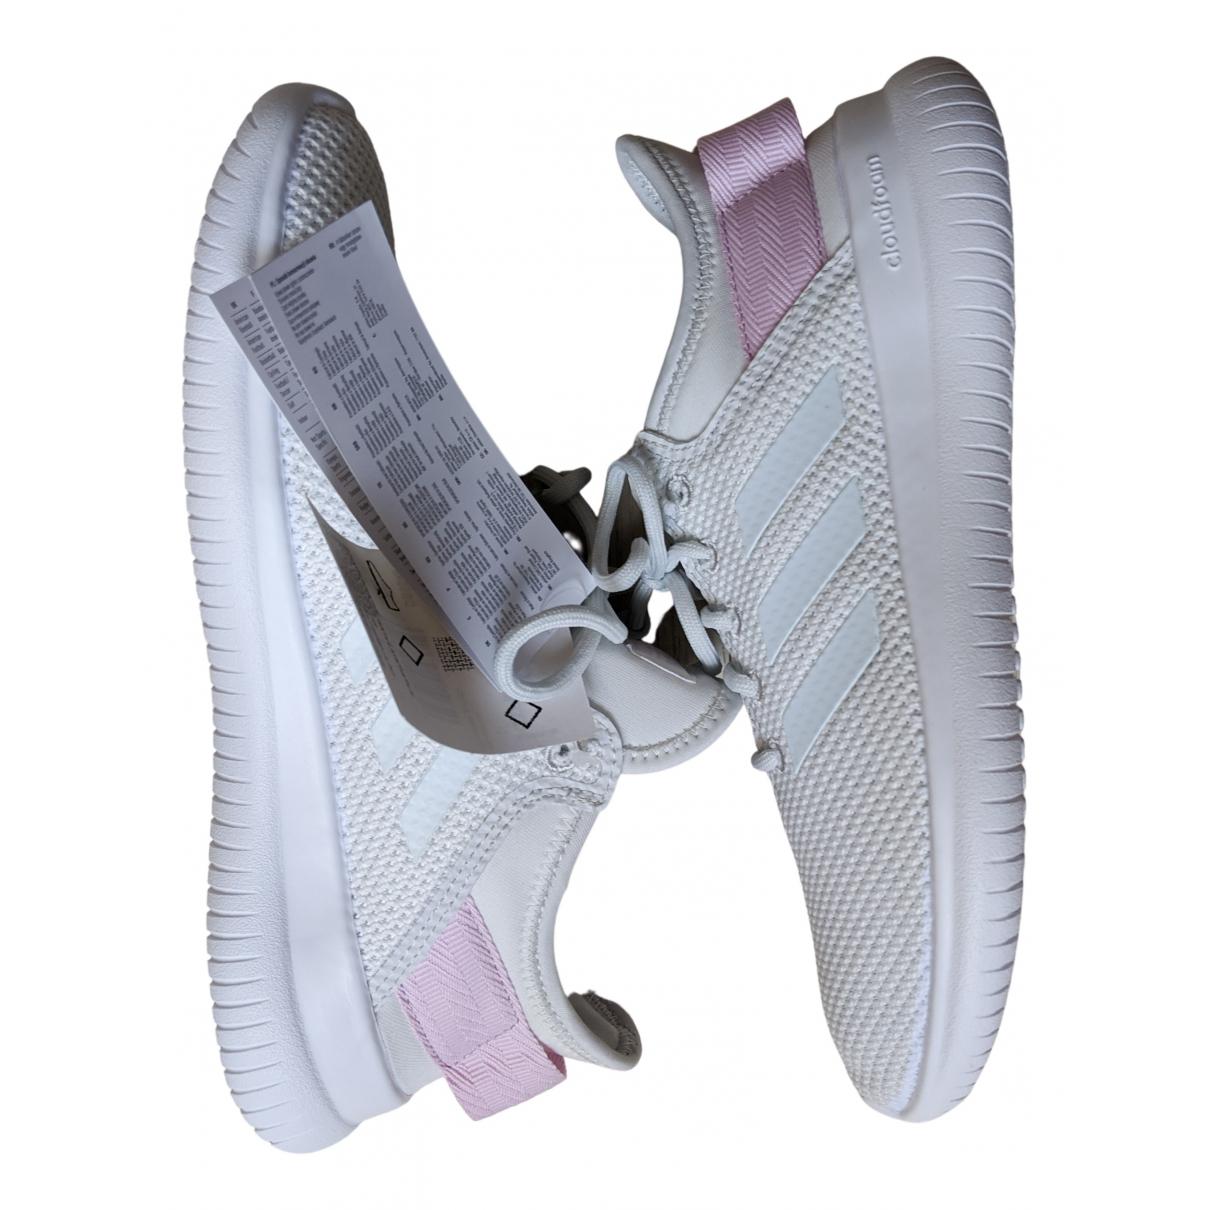 Adidas N White Cloth Trainers for Women 38.5 EU